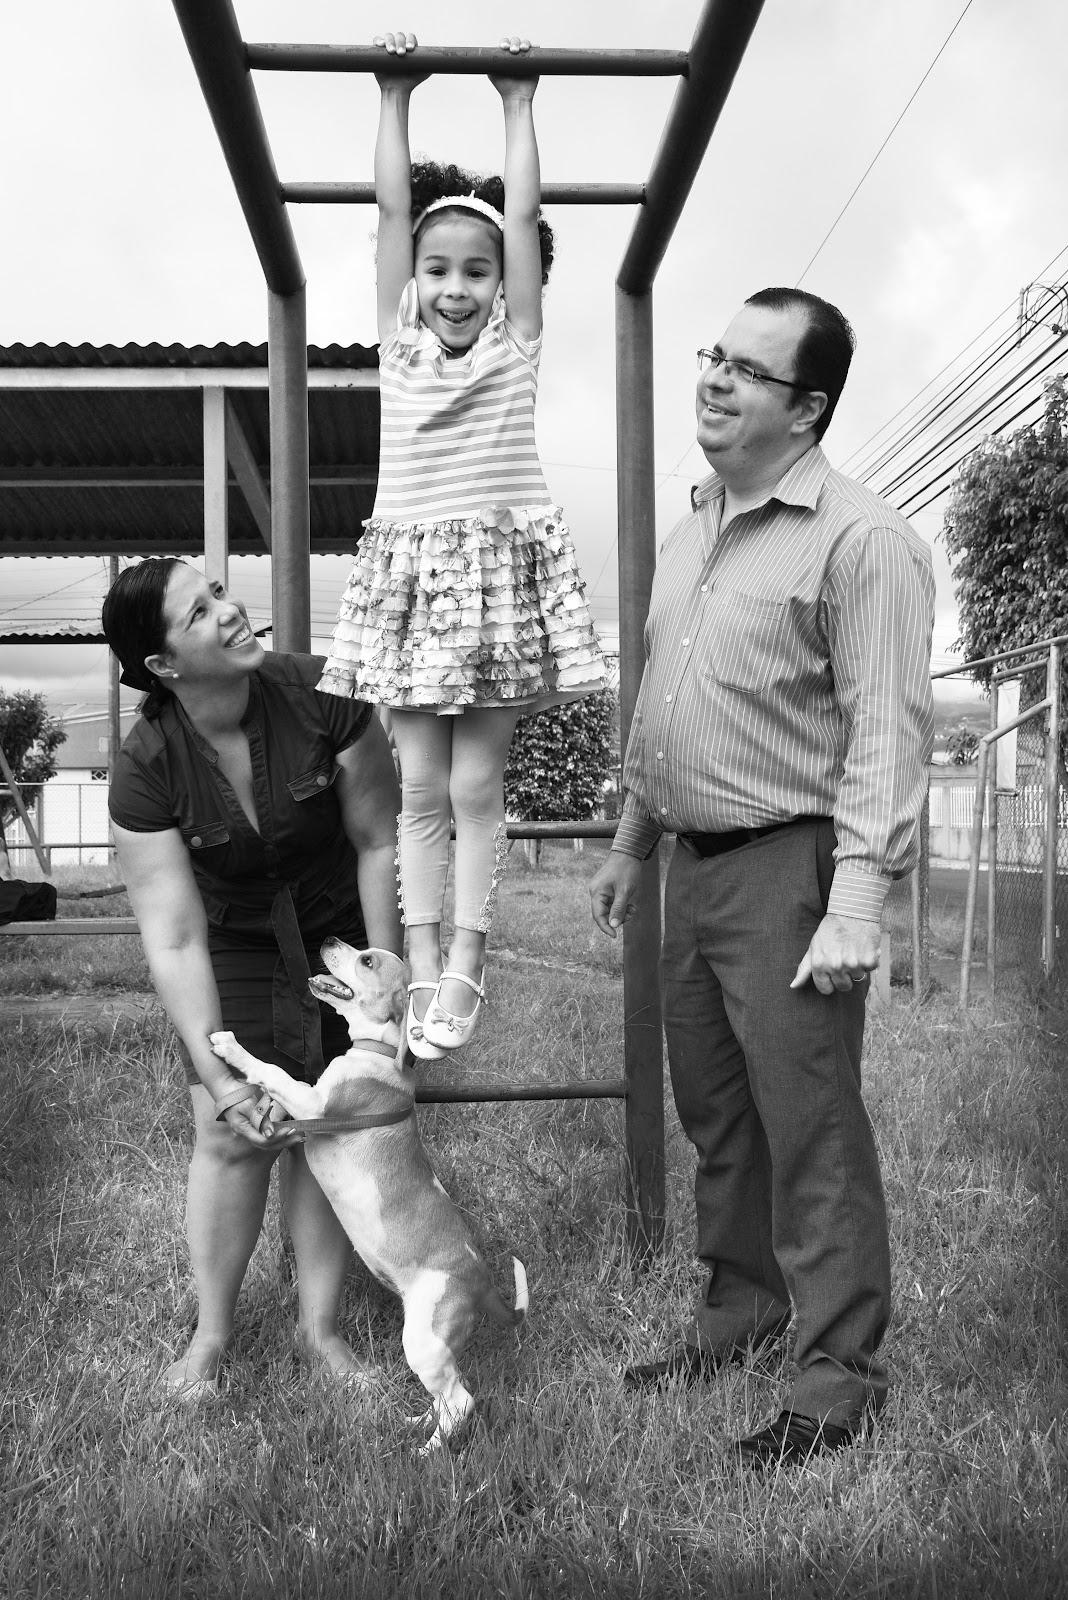 Familia: Su esposa Yoslaidy Rivera, su hija Ivanna Vargas y su mascota Ela. (Foto: Ruth Garita/OCM)